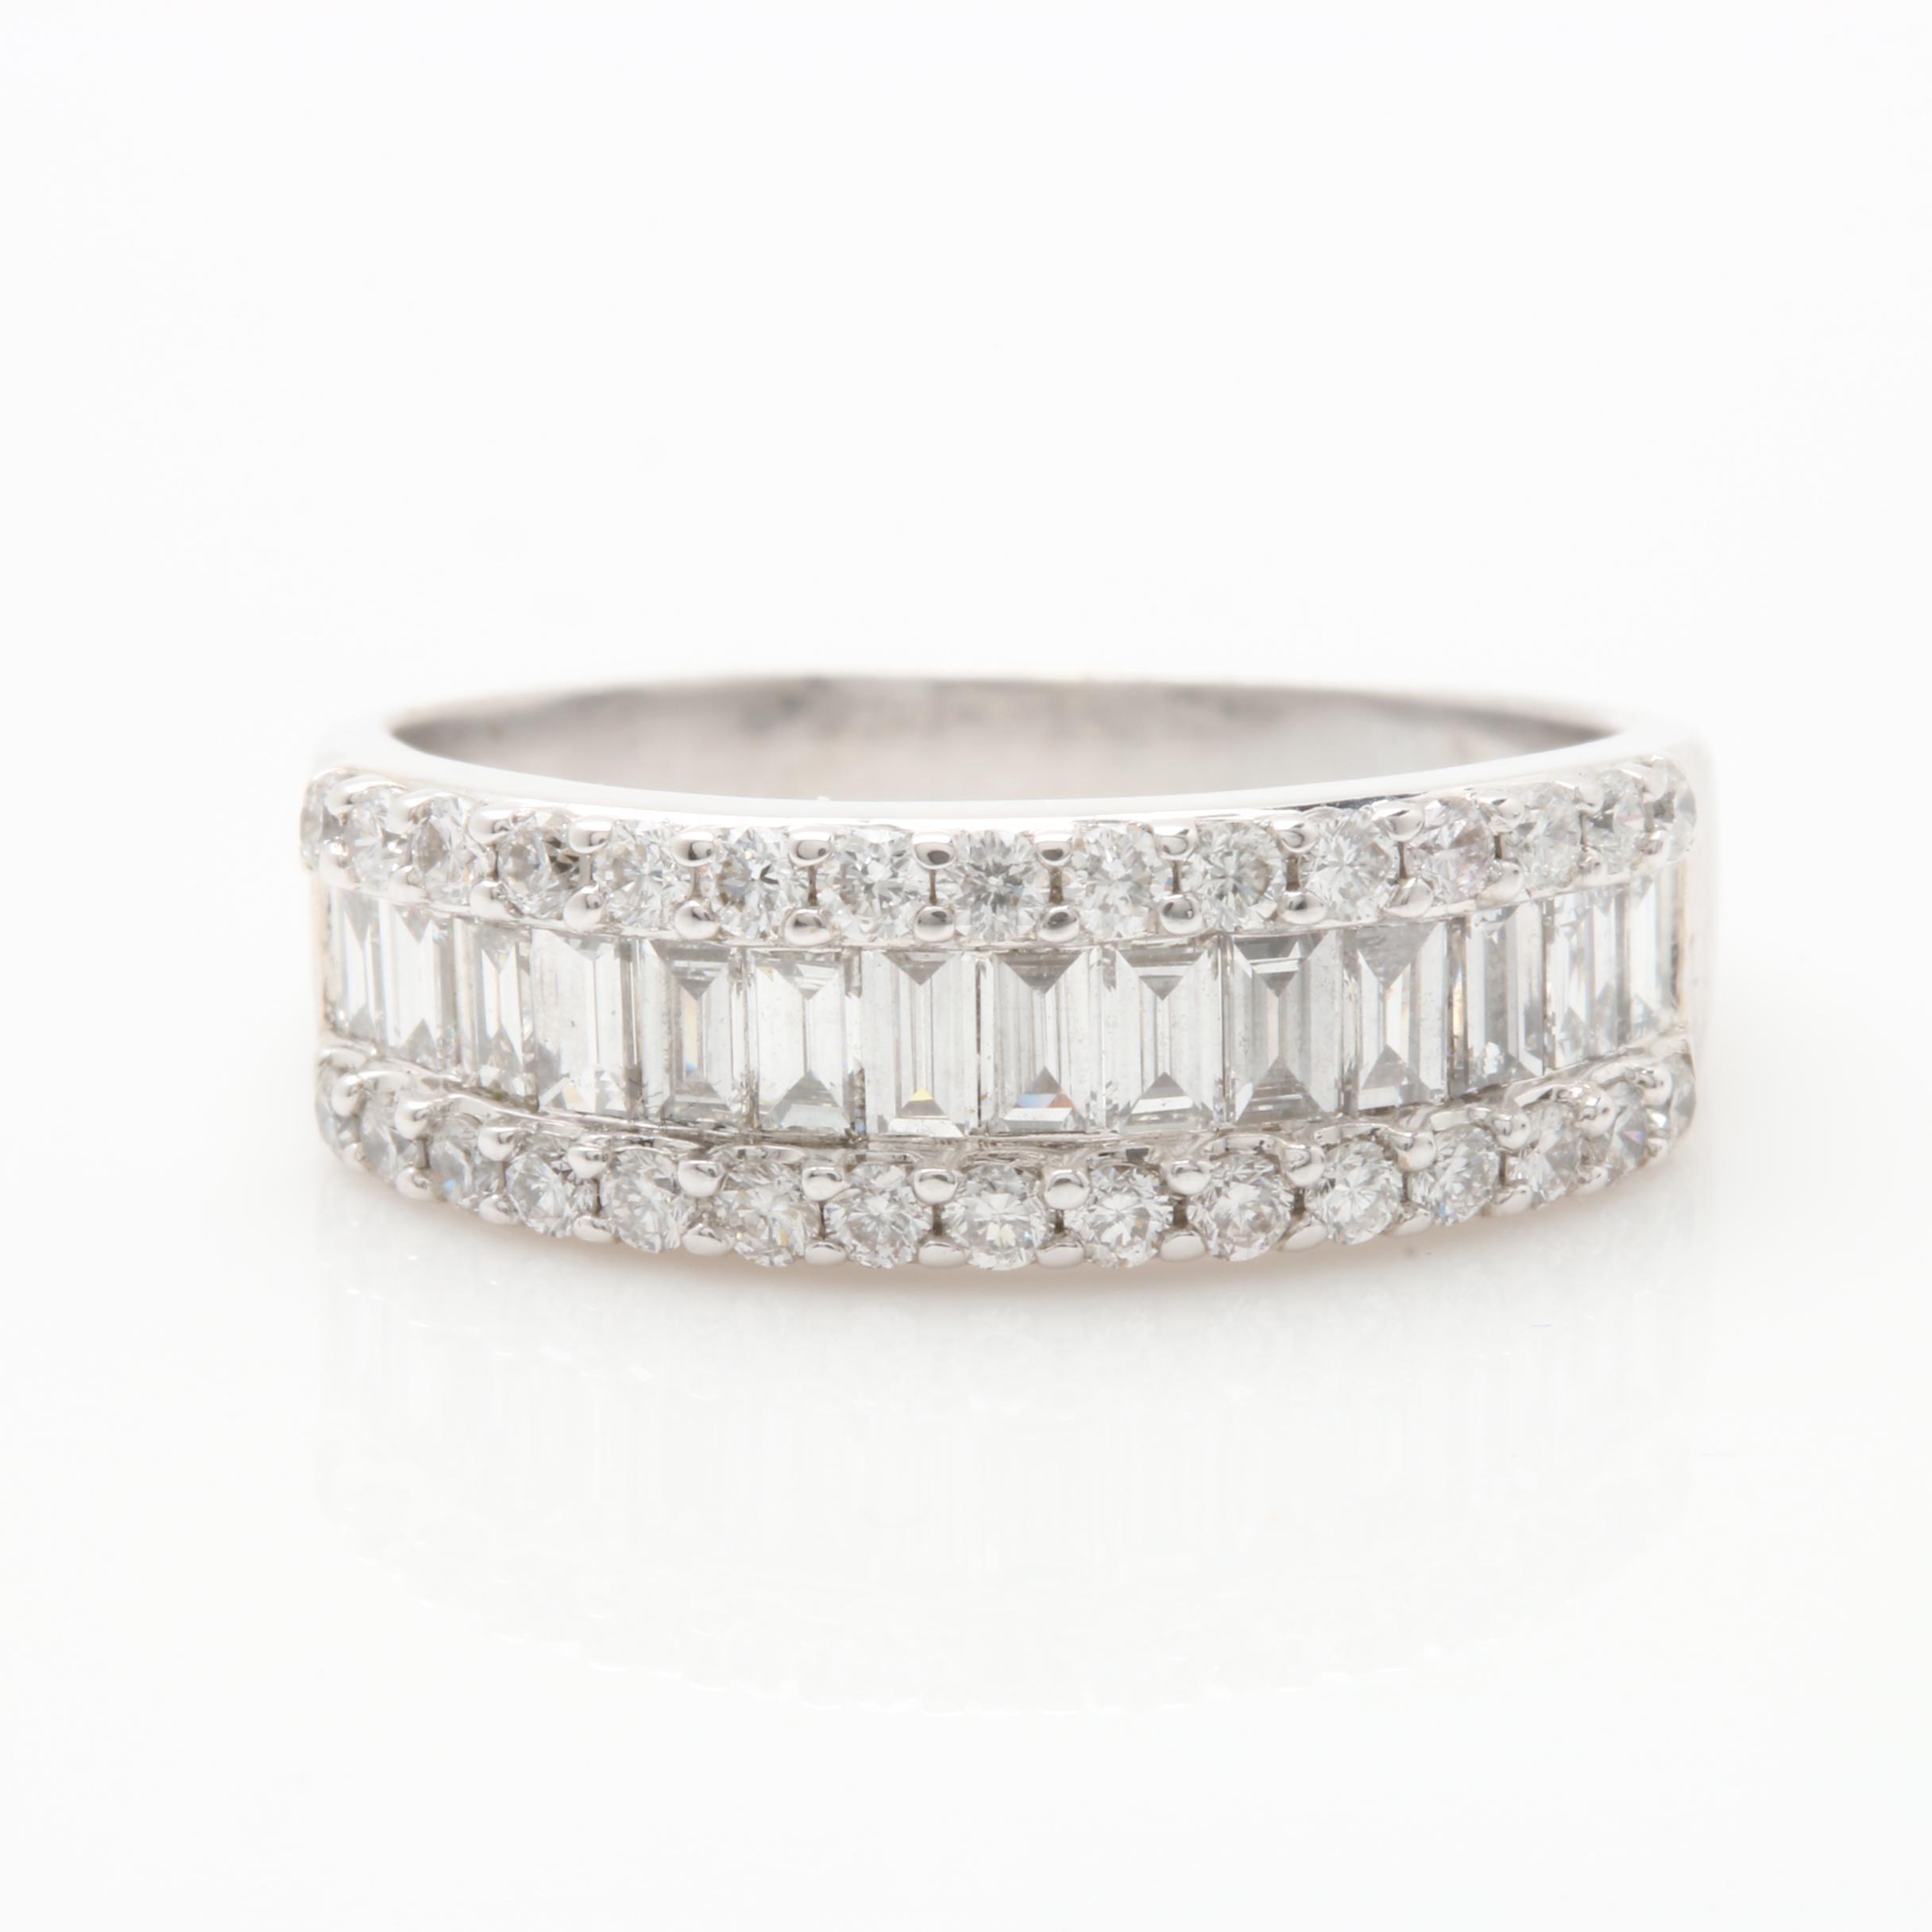 18K White Gold 1.03 CTW Diamond Ring